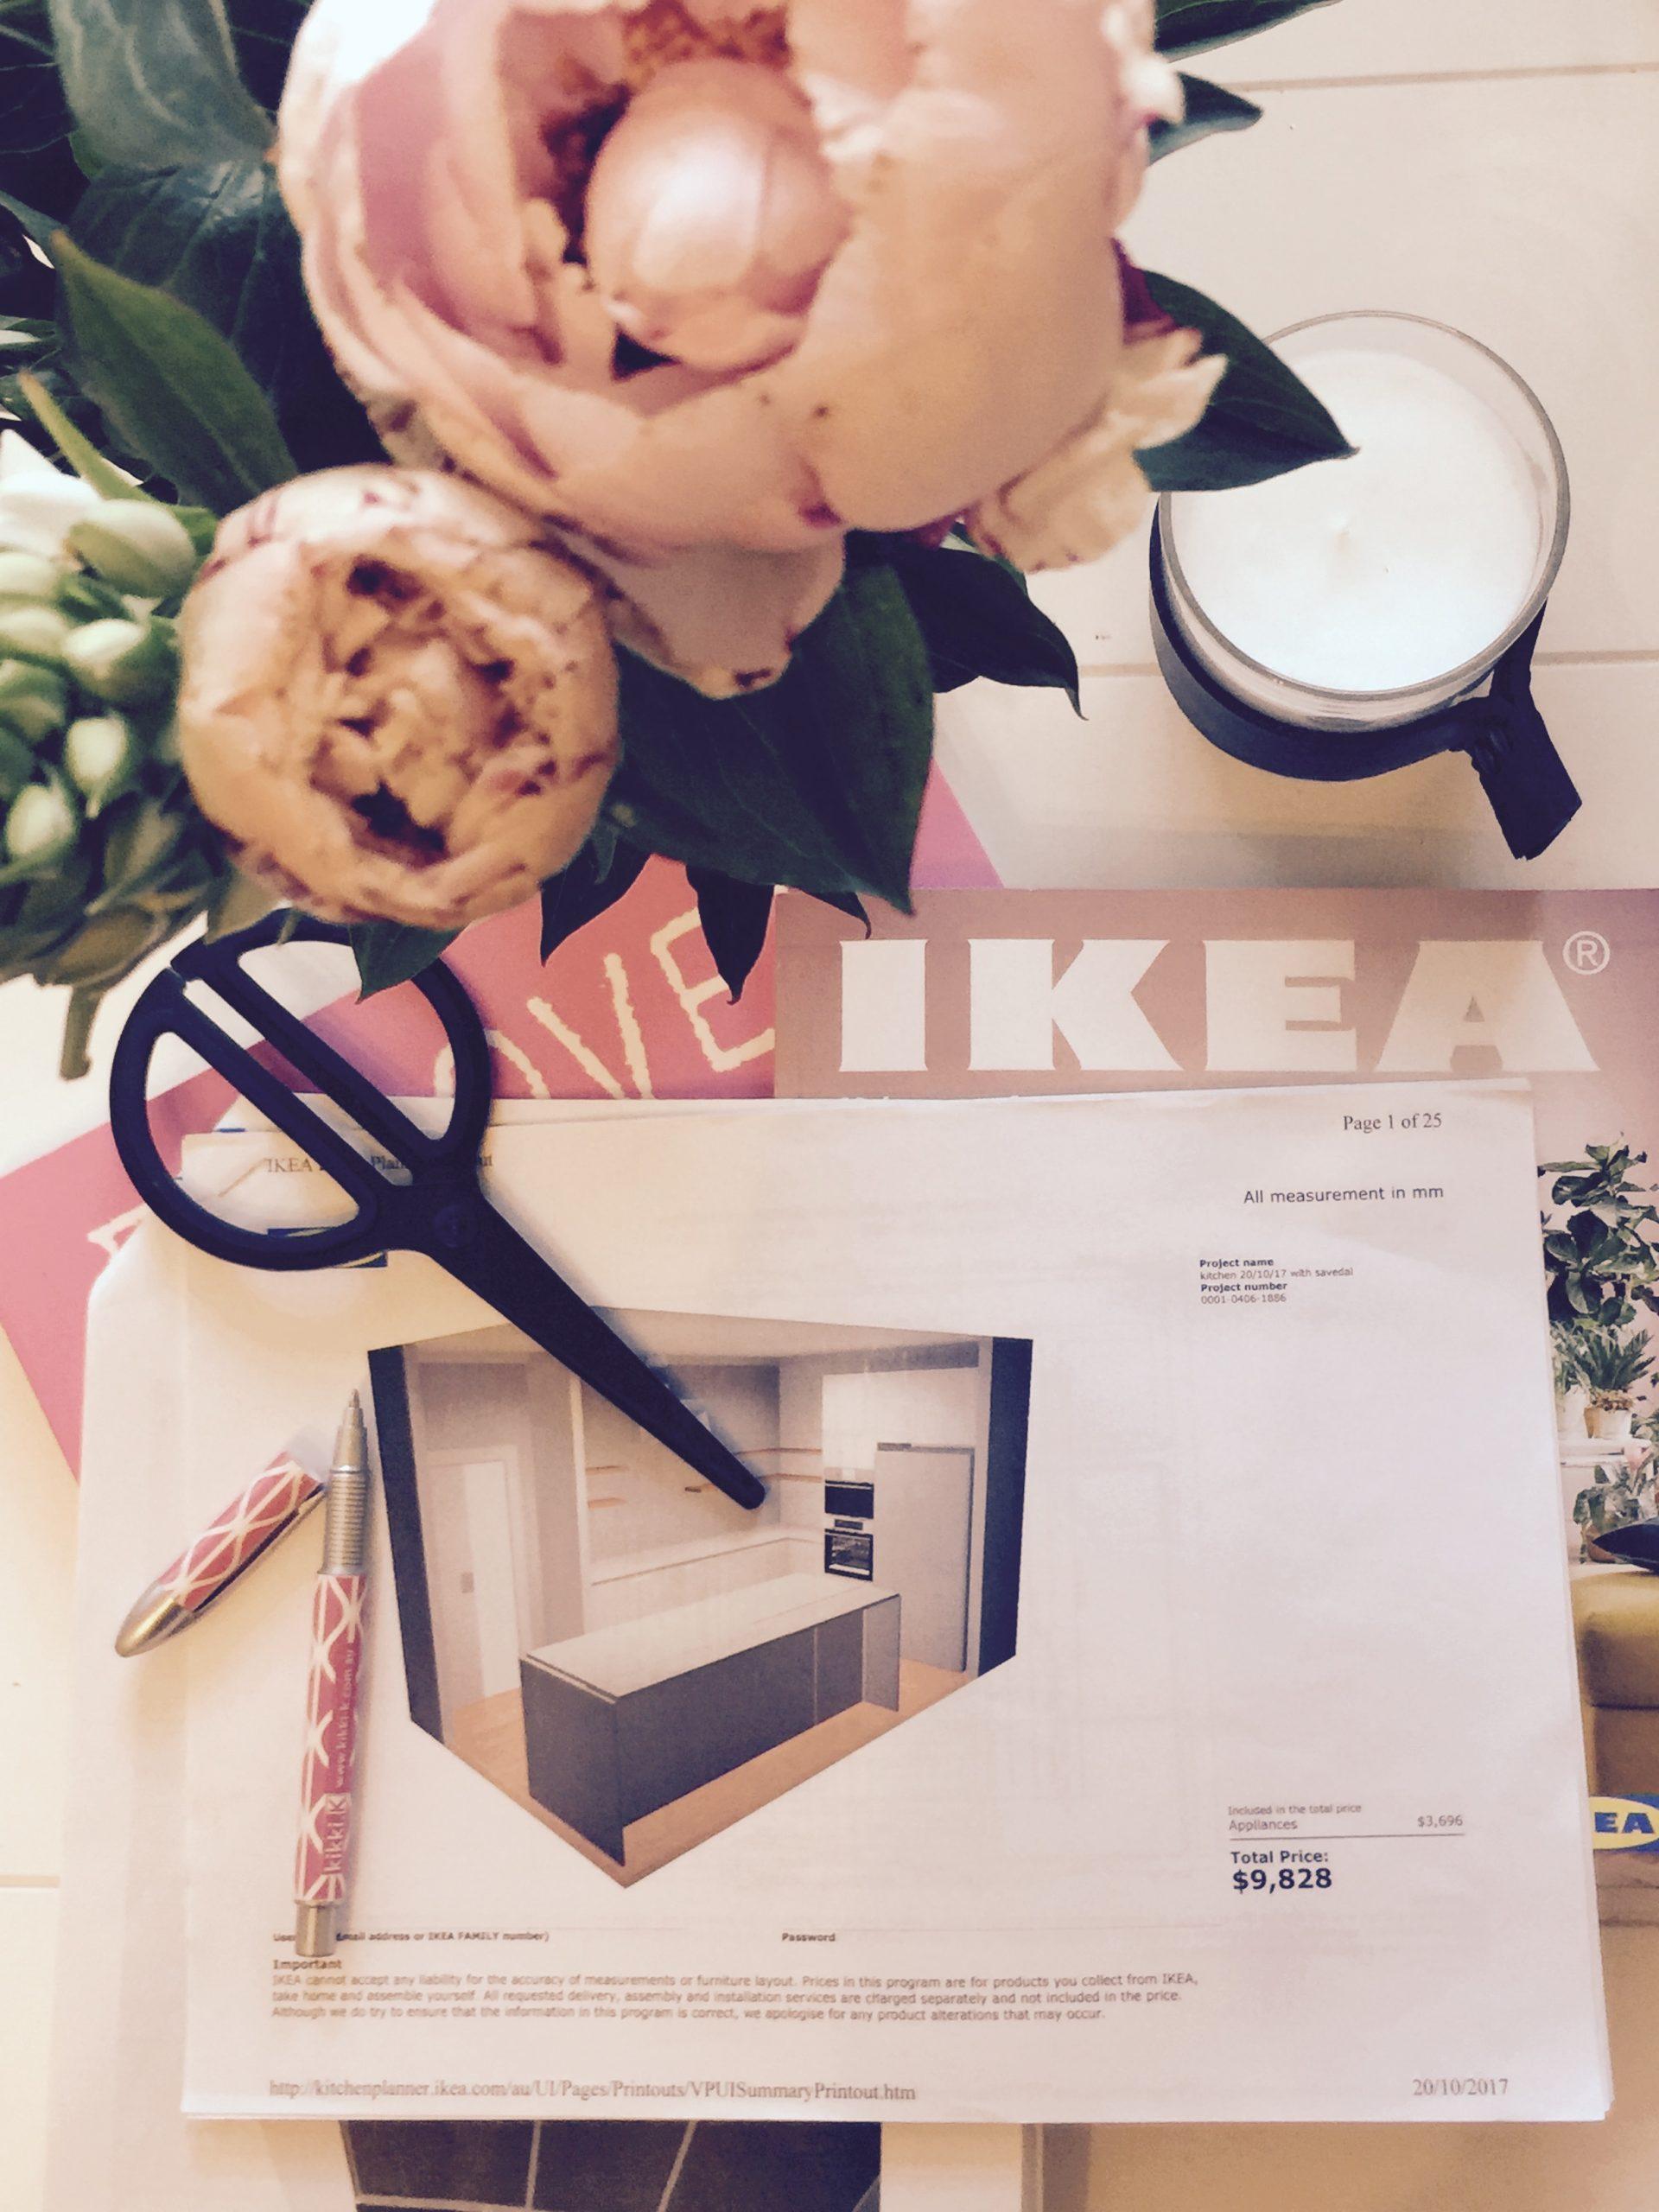 Interior Design with IKEA